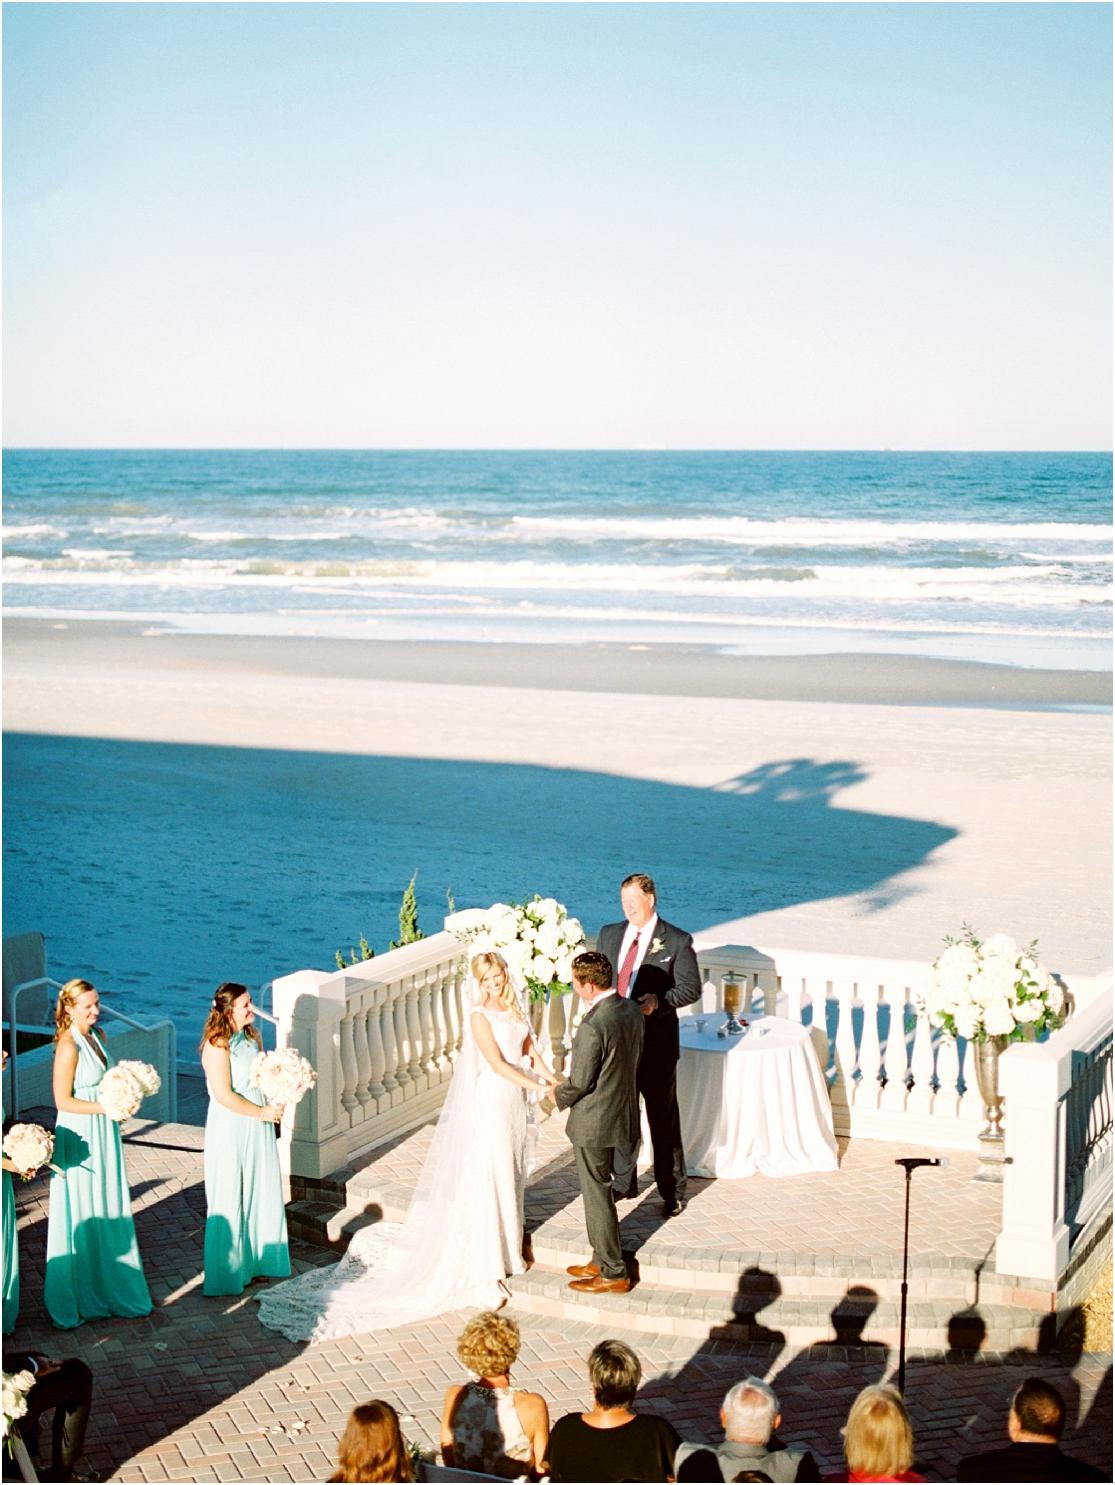 Lisa Silva Photography- Ponte Vedra Beach and Jacksonville, Florida Fine Art Film Wedding Photography- Wedding at the Ponte Vedra Inn and Club_0053.jpg